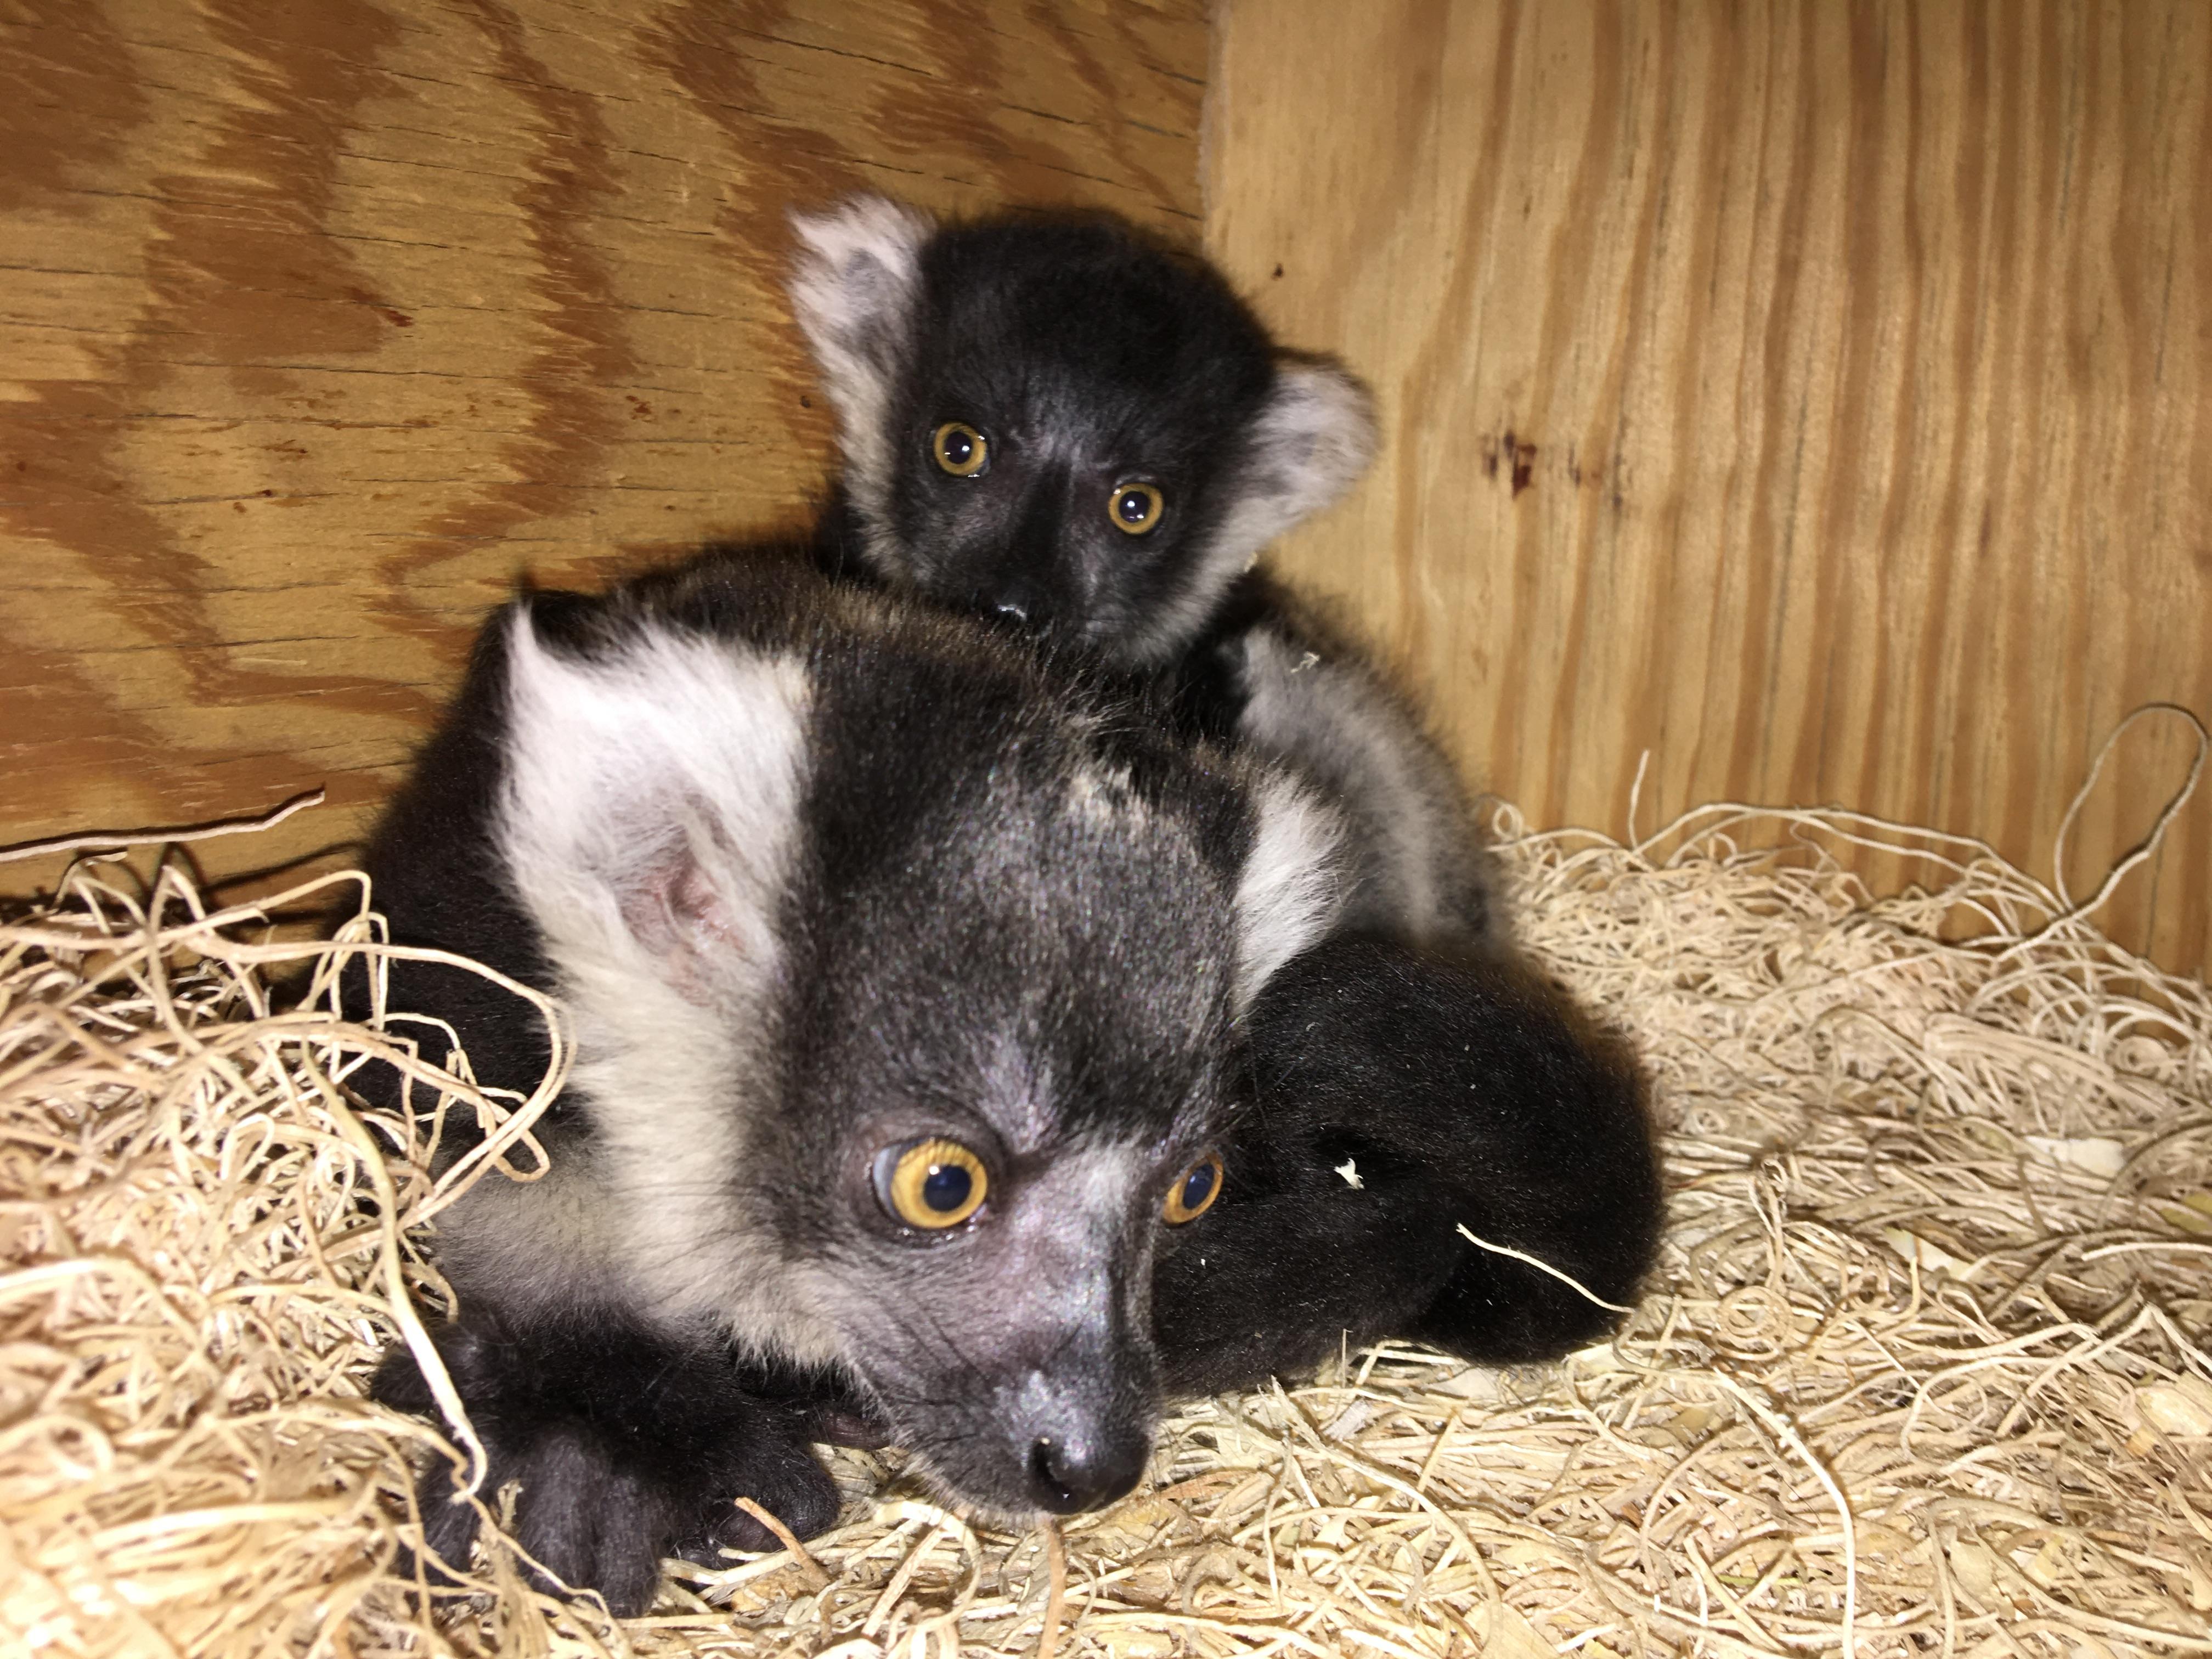 Philadelphia Zoo lemurs